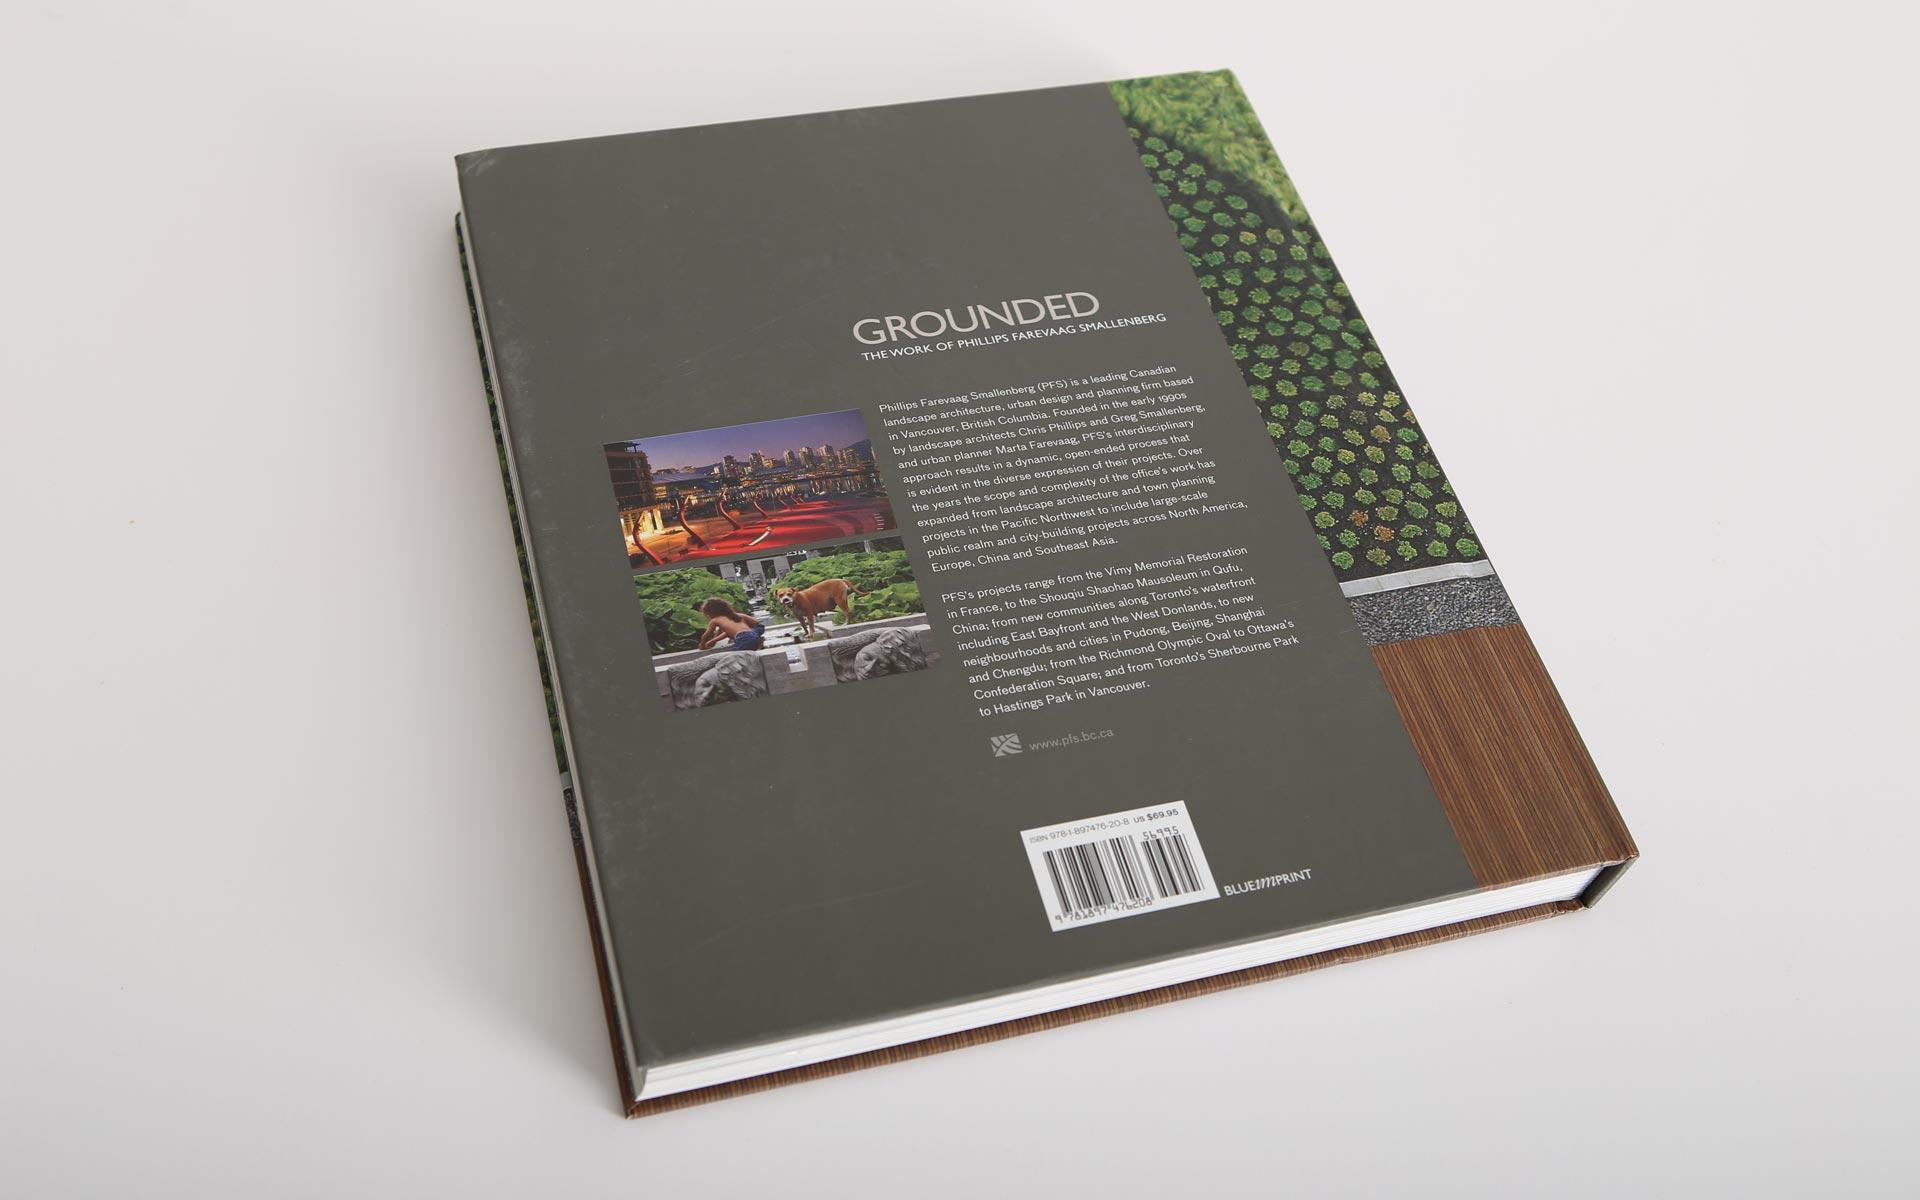 pfs-landscape-architects-book-design-11